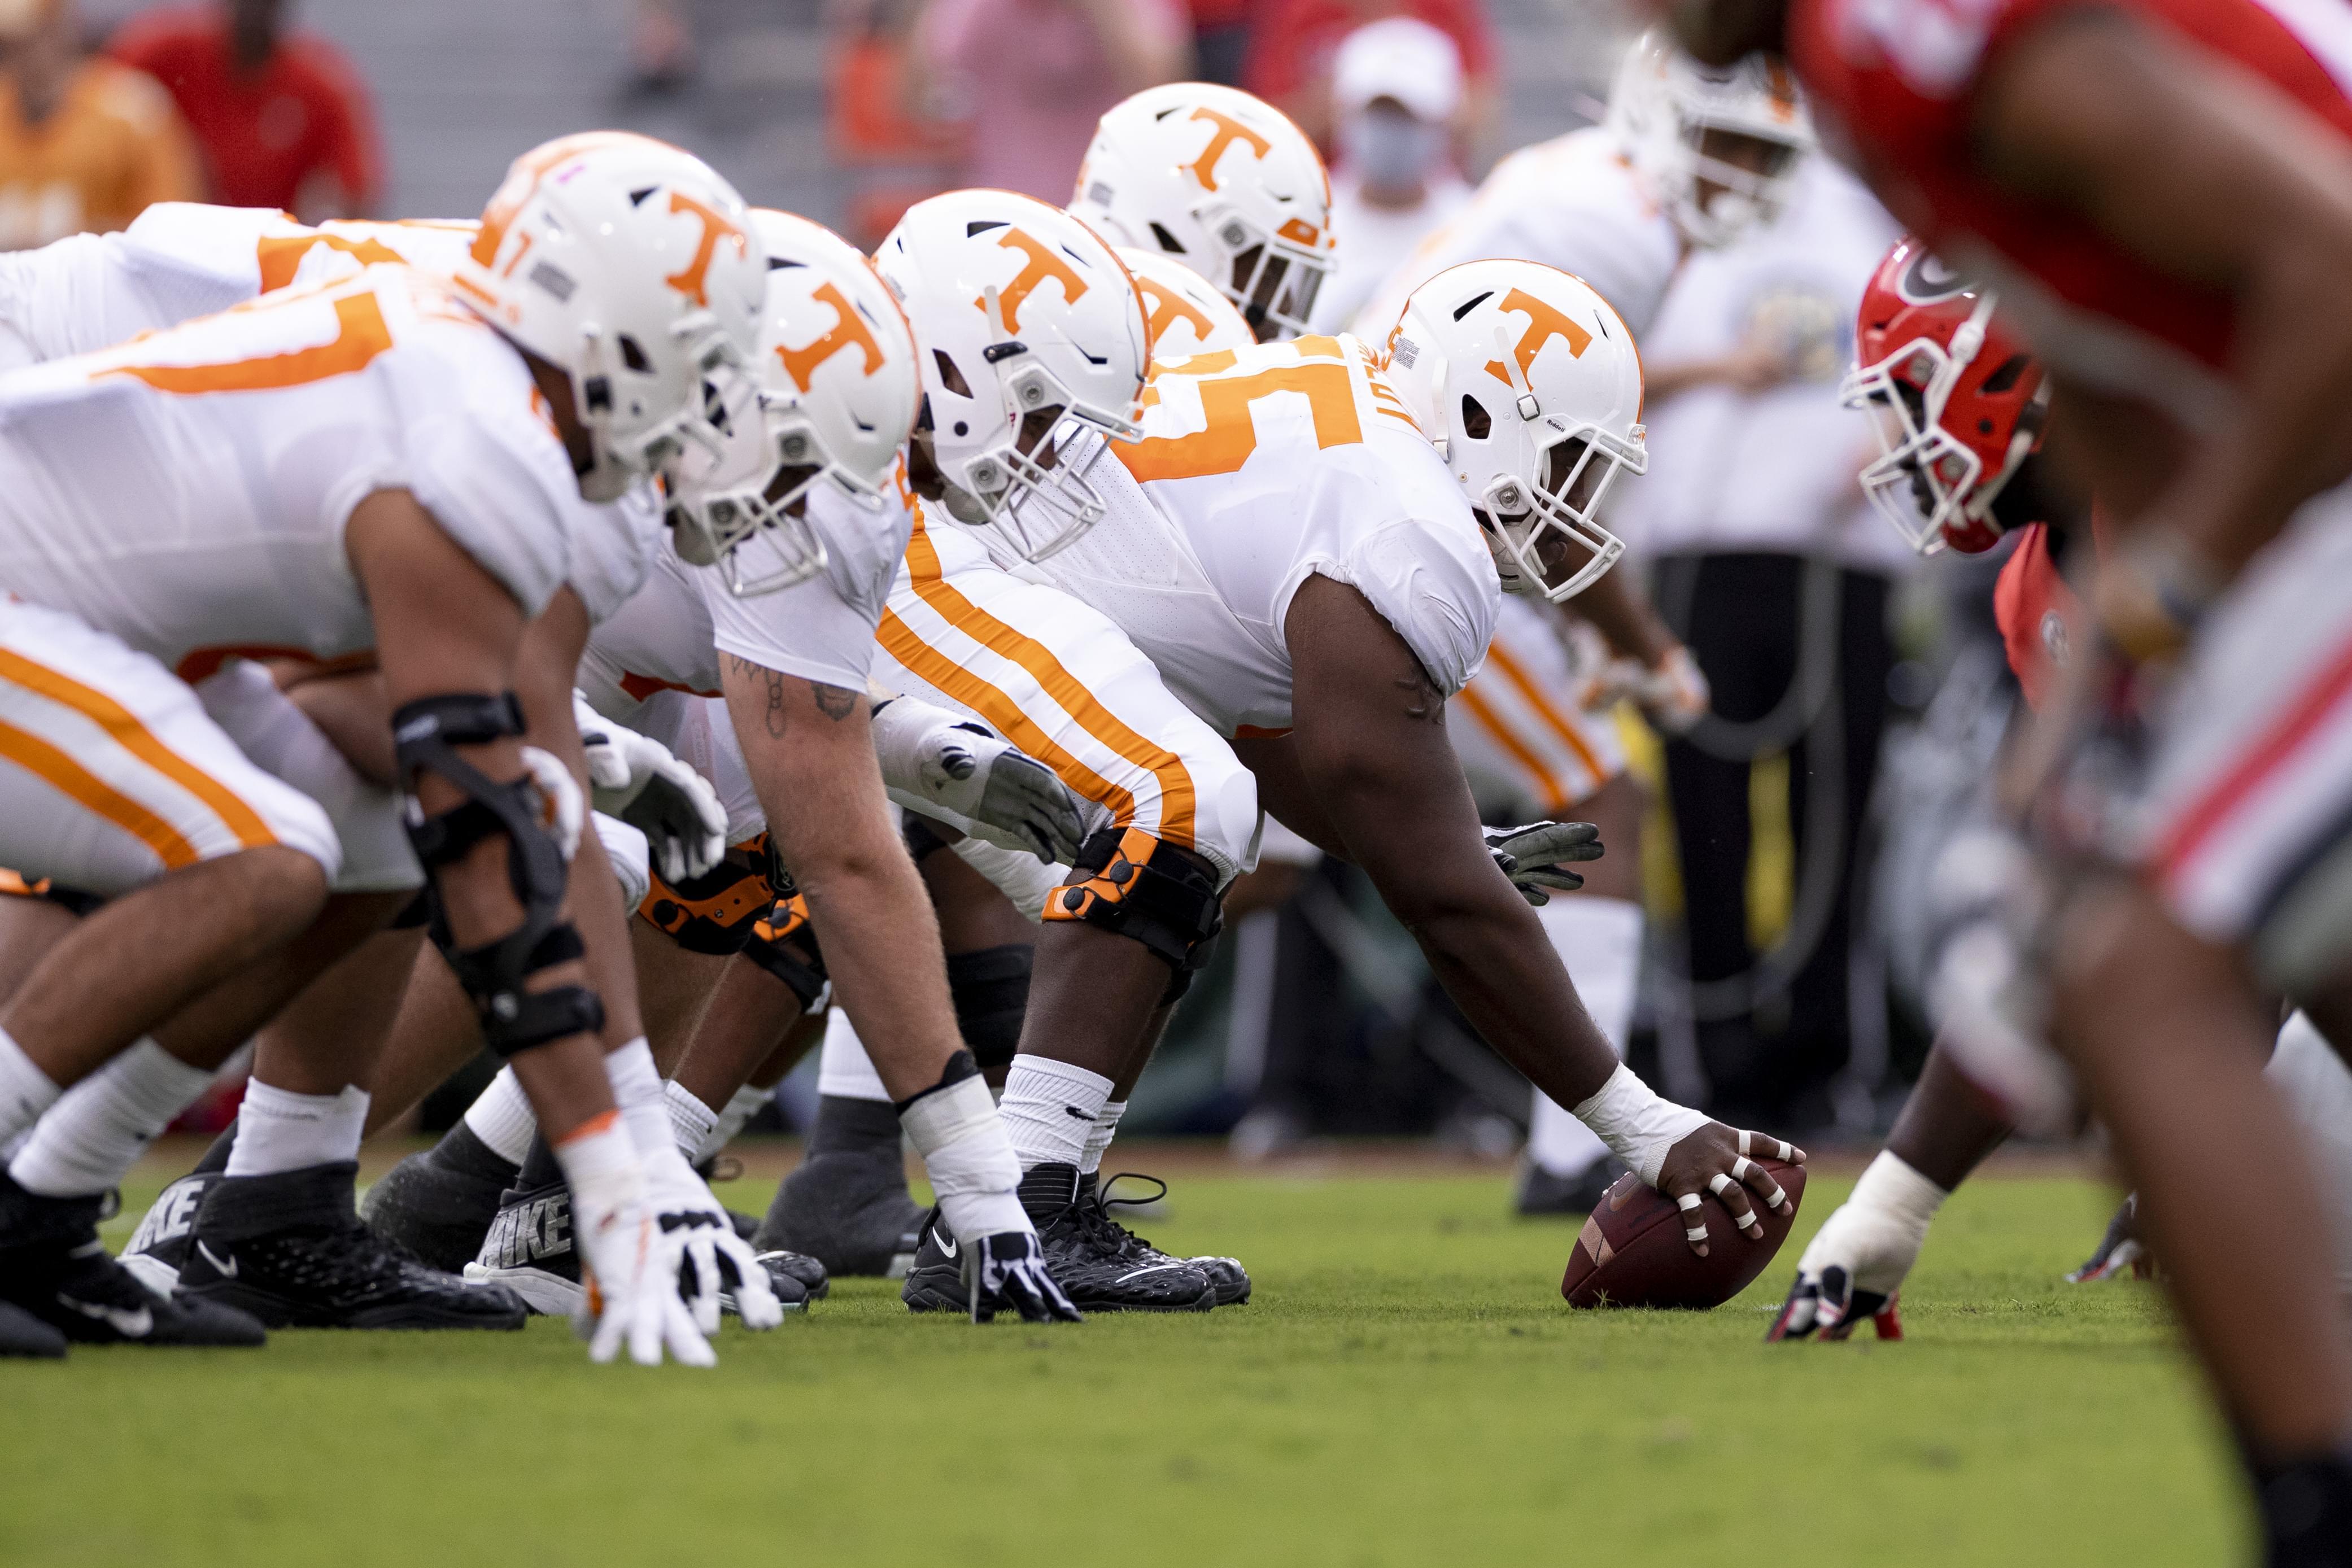 SEC Football Bowl Assignments Announced – UT vs. WVU in Liberty